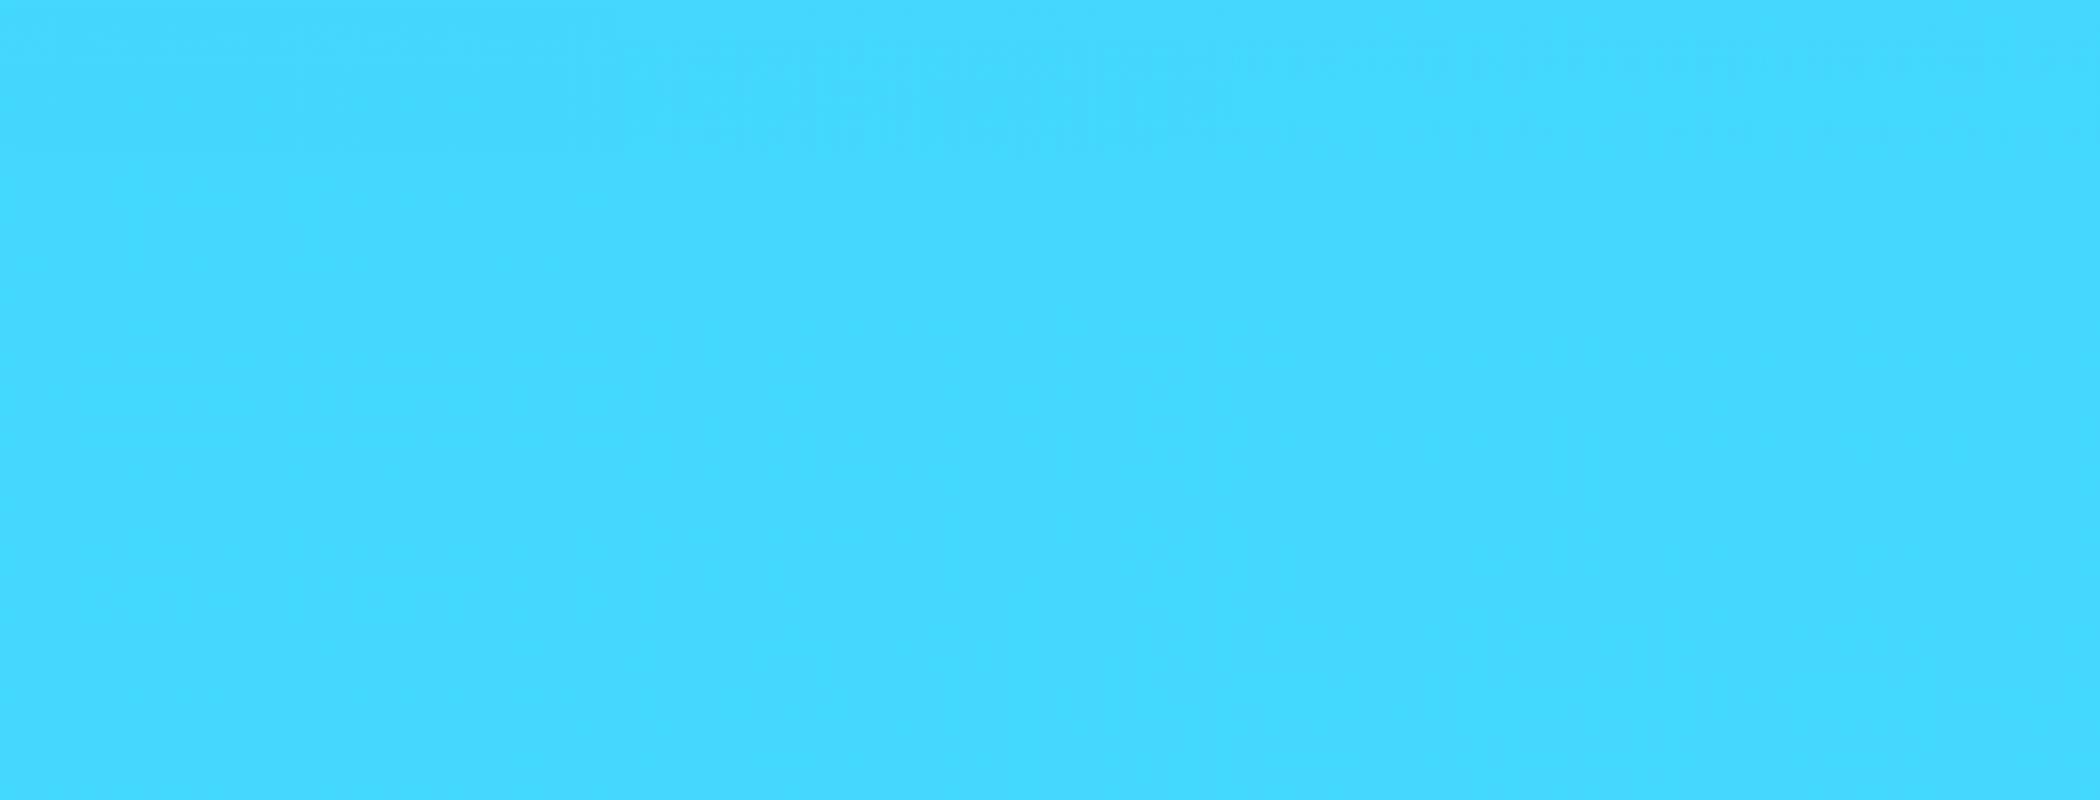 carre-bleu-manif-pour-ouighours